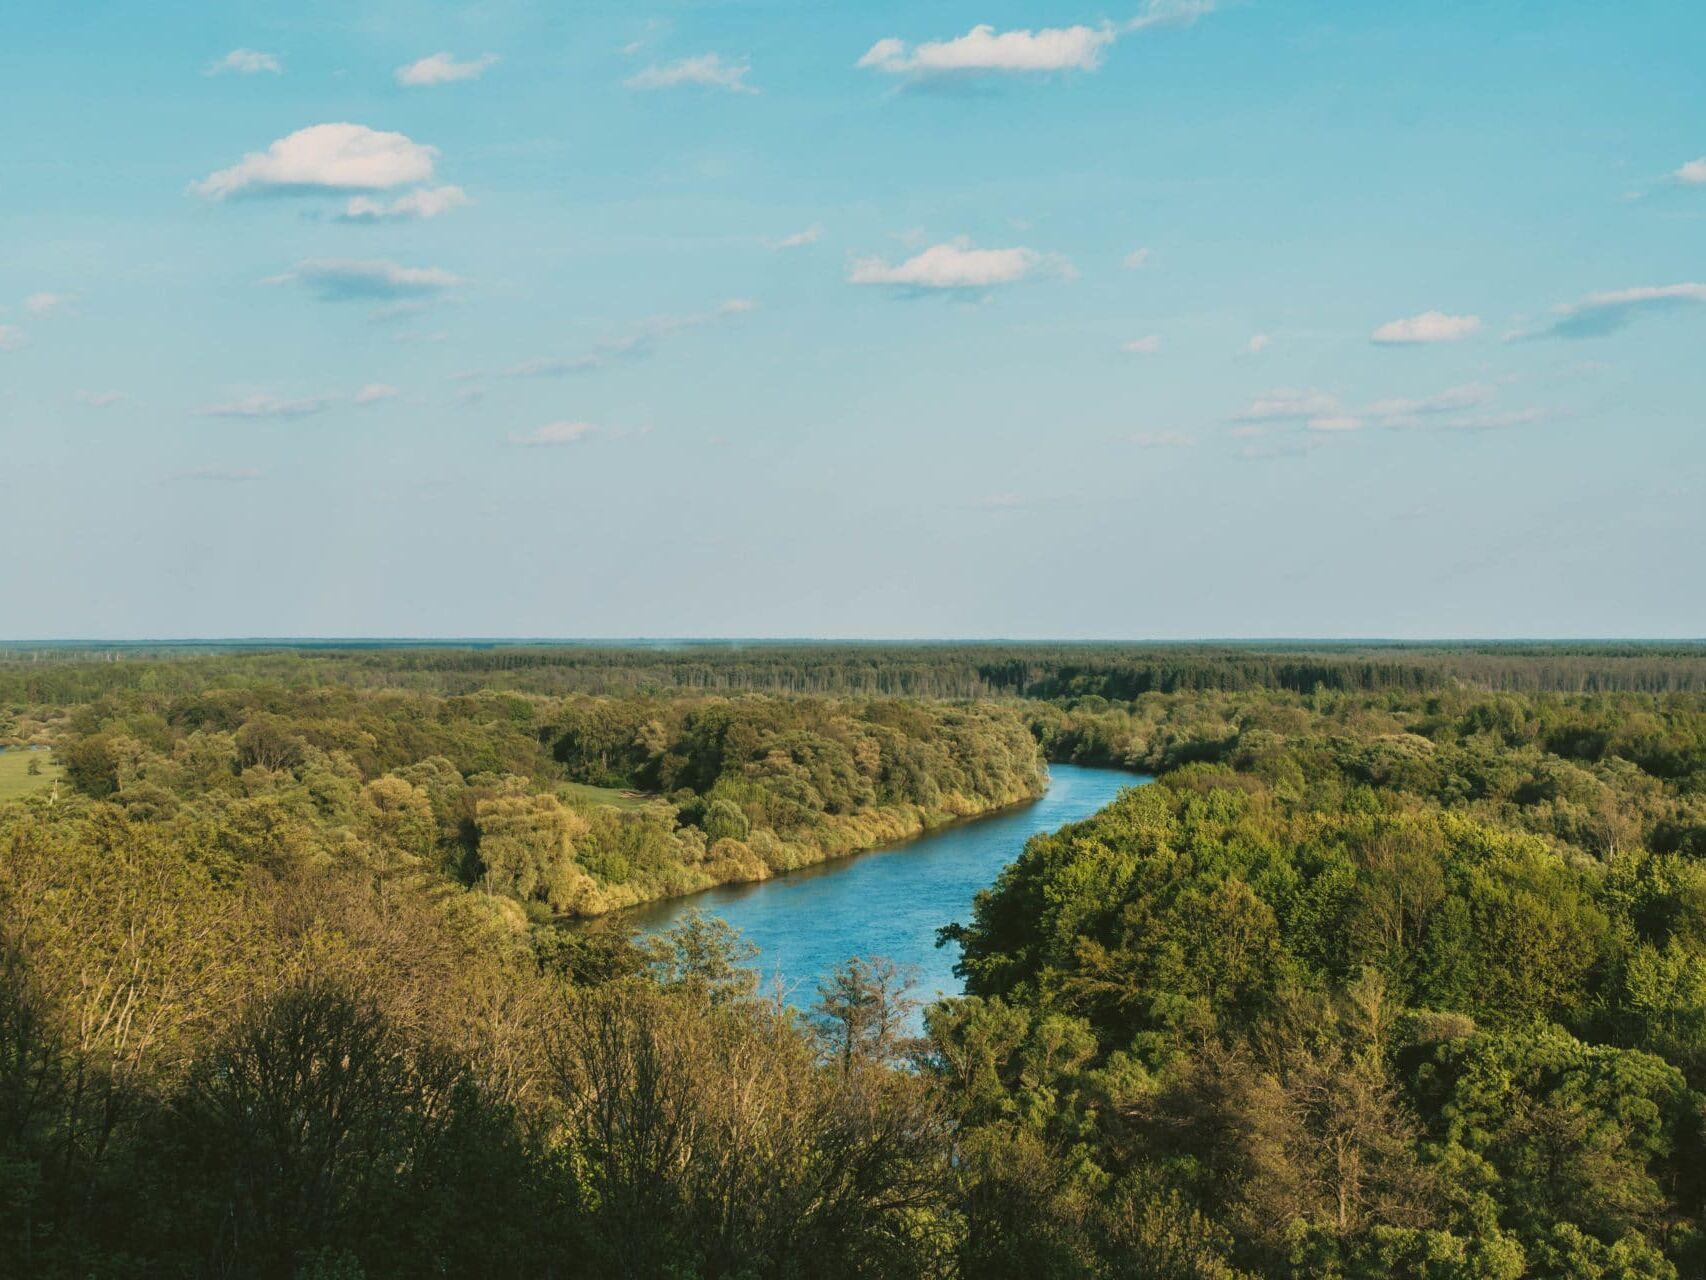 Красивая природа, фотограф Яна Фахуретдинова